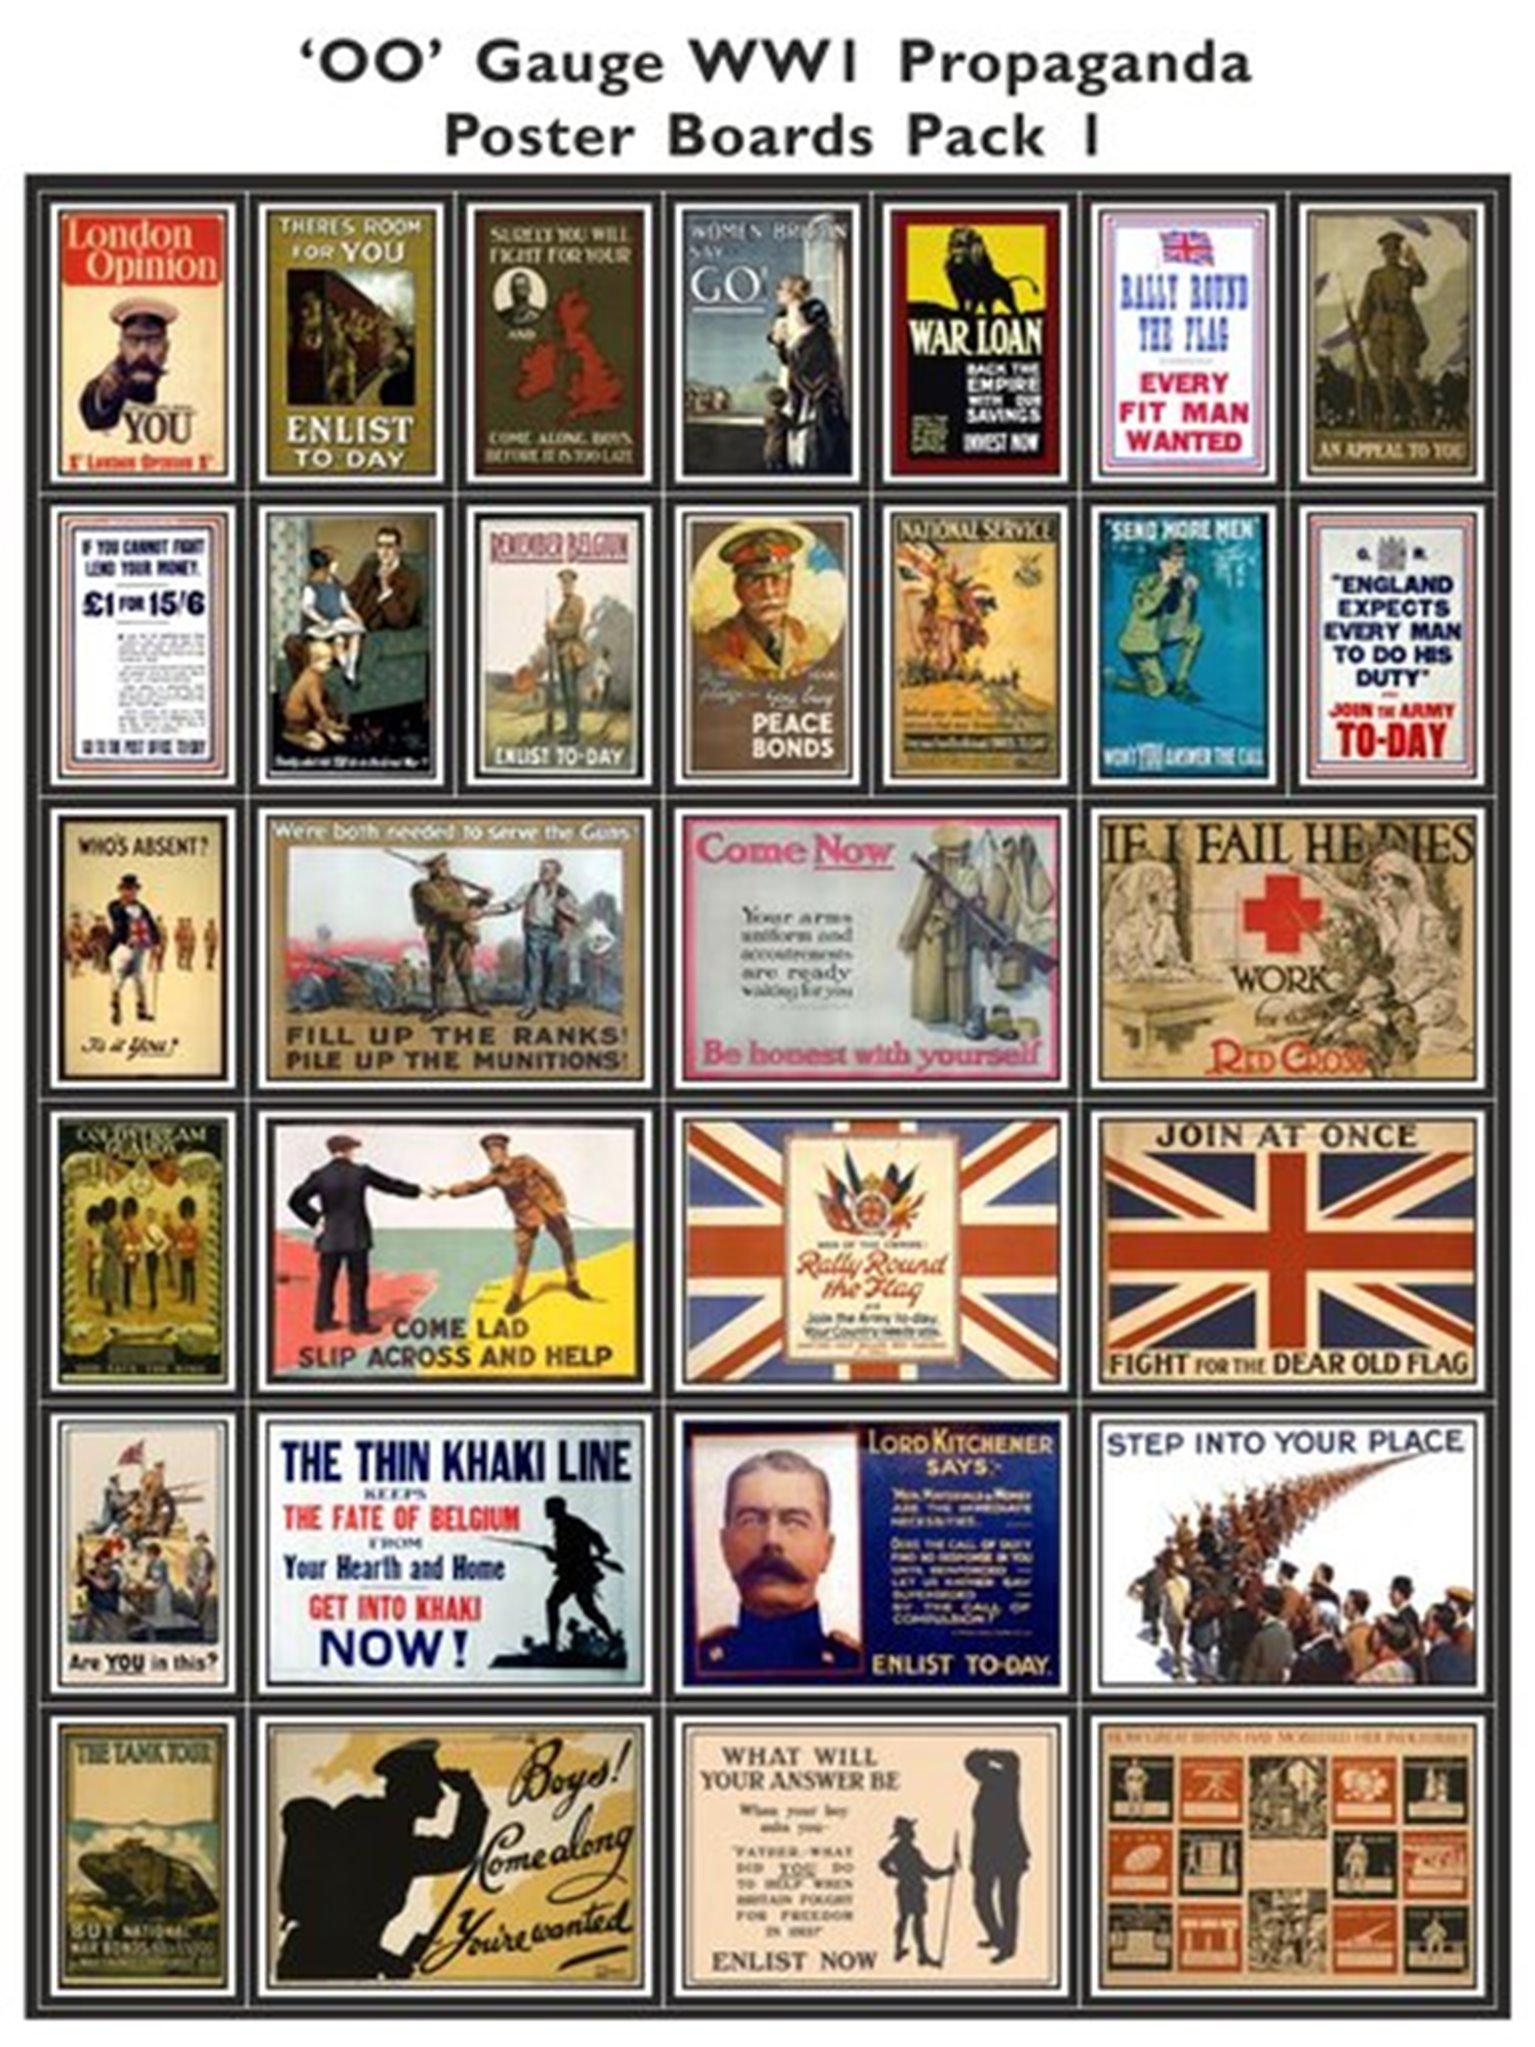 WW1 Propaganda Poster Boards Pack 1